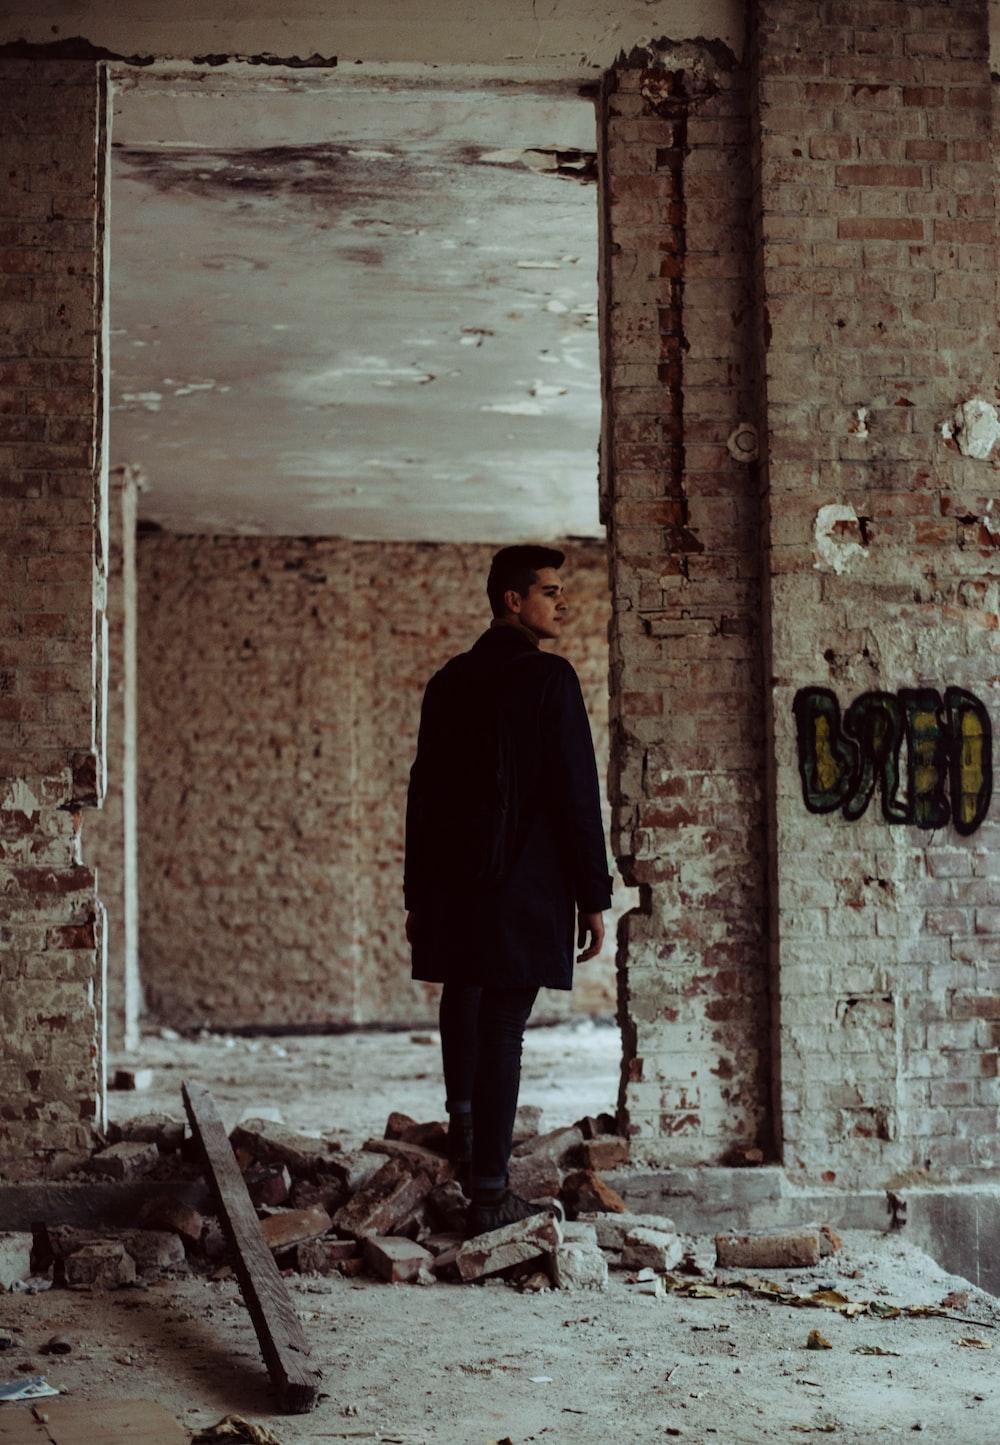 man wearing black suit walking in abandoned building